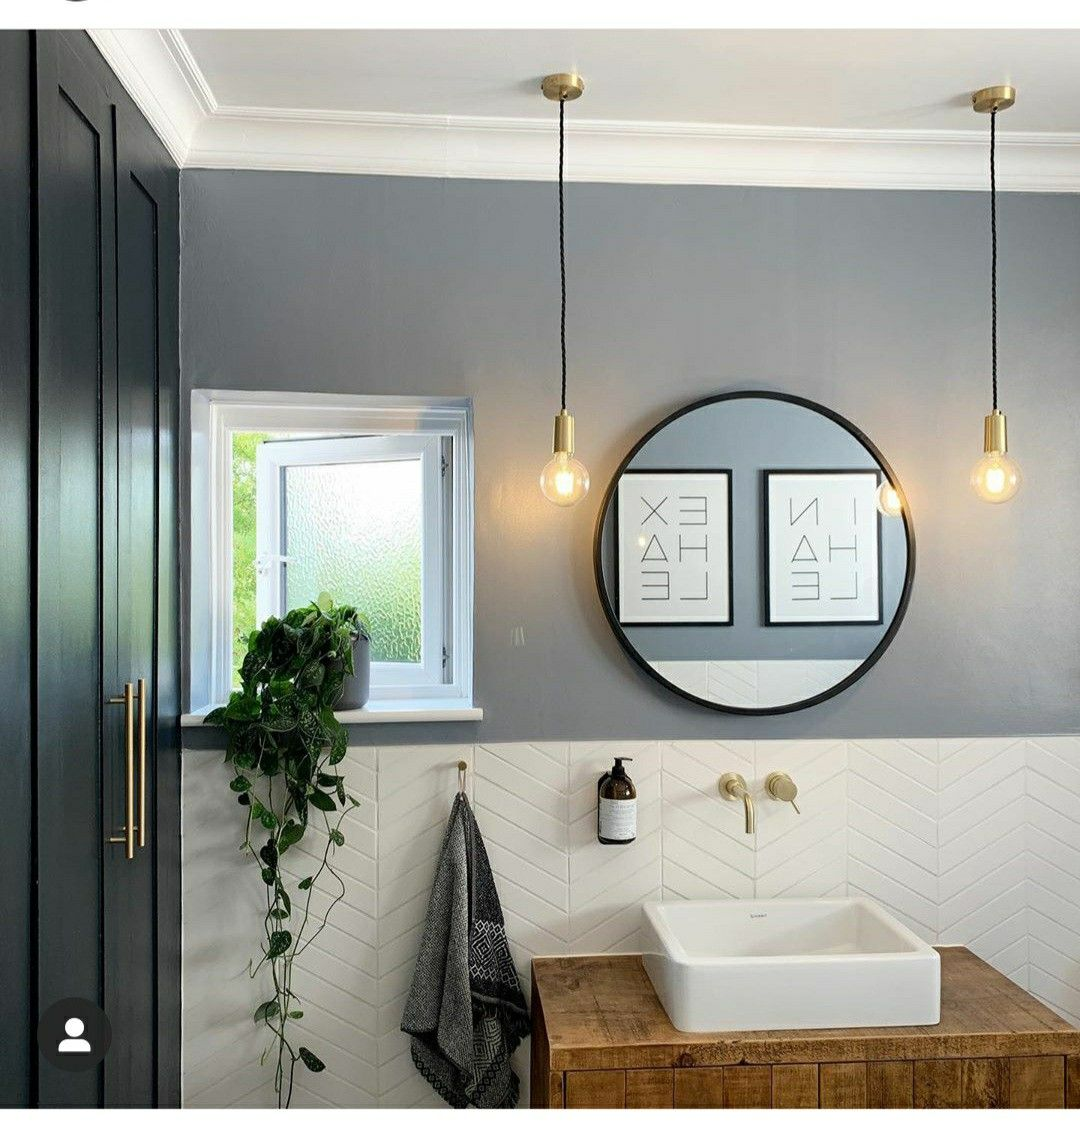 Bathroom Pendant Light Bathroom Pendant Lighting Bathroom Pendant Bathroom Hanging Lights